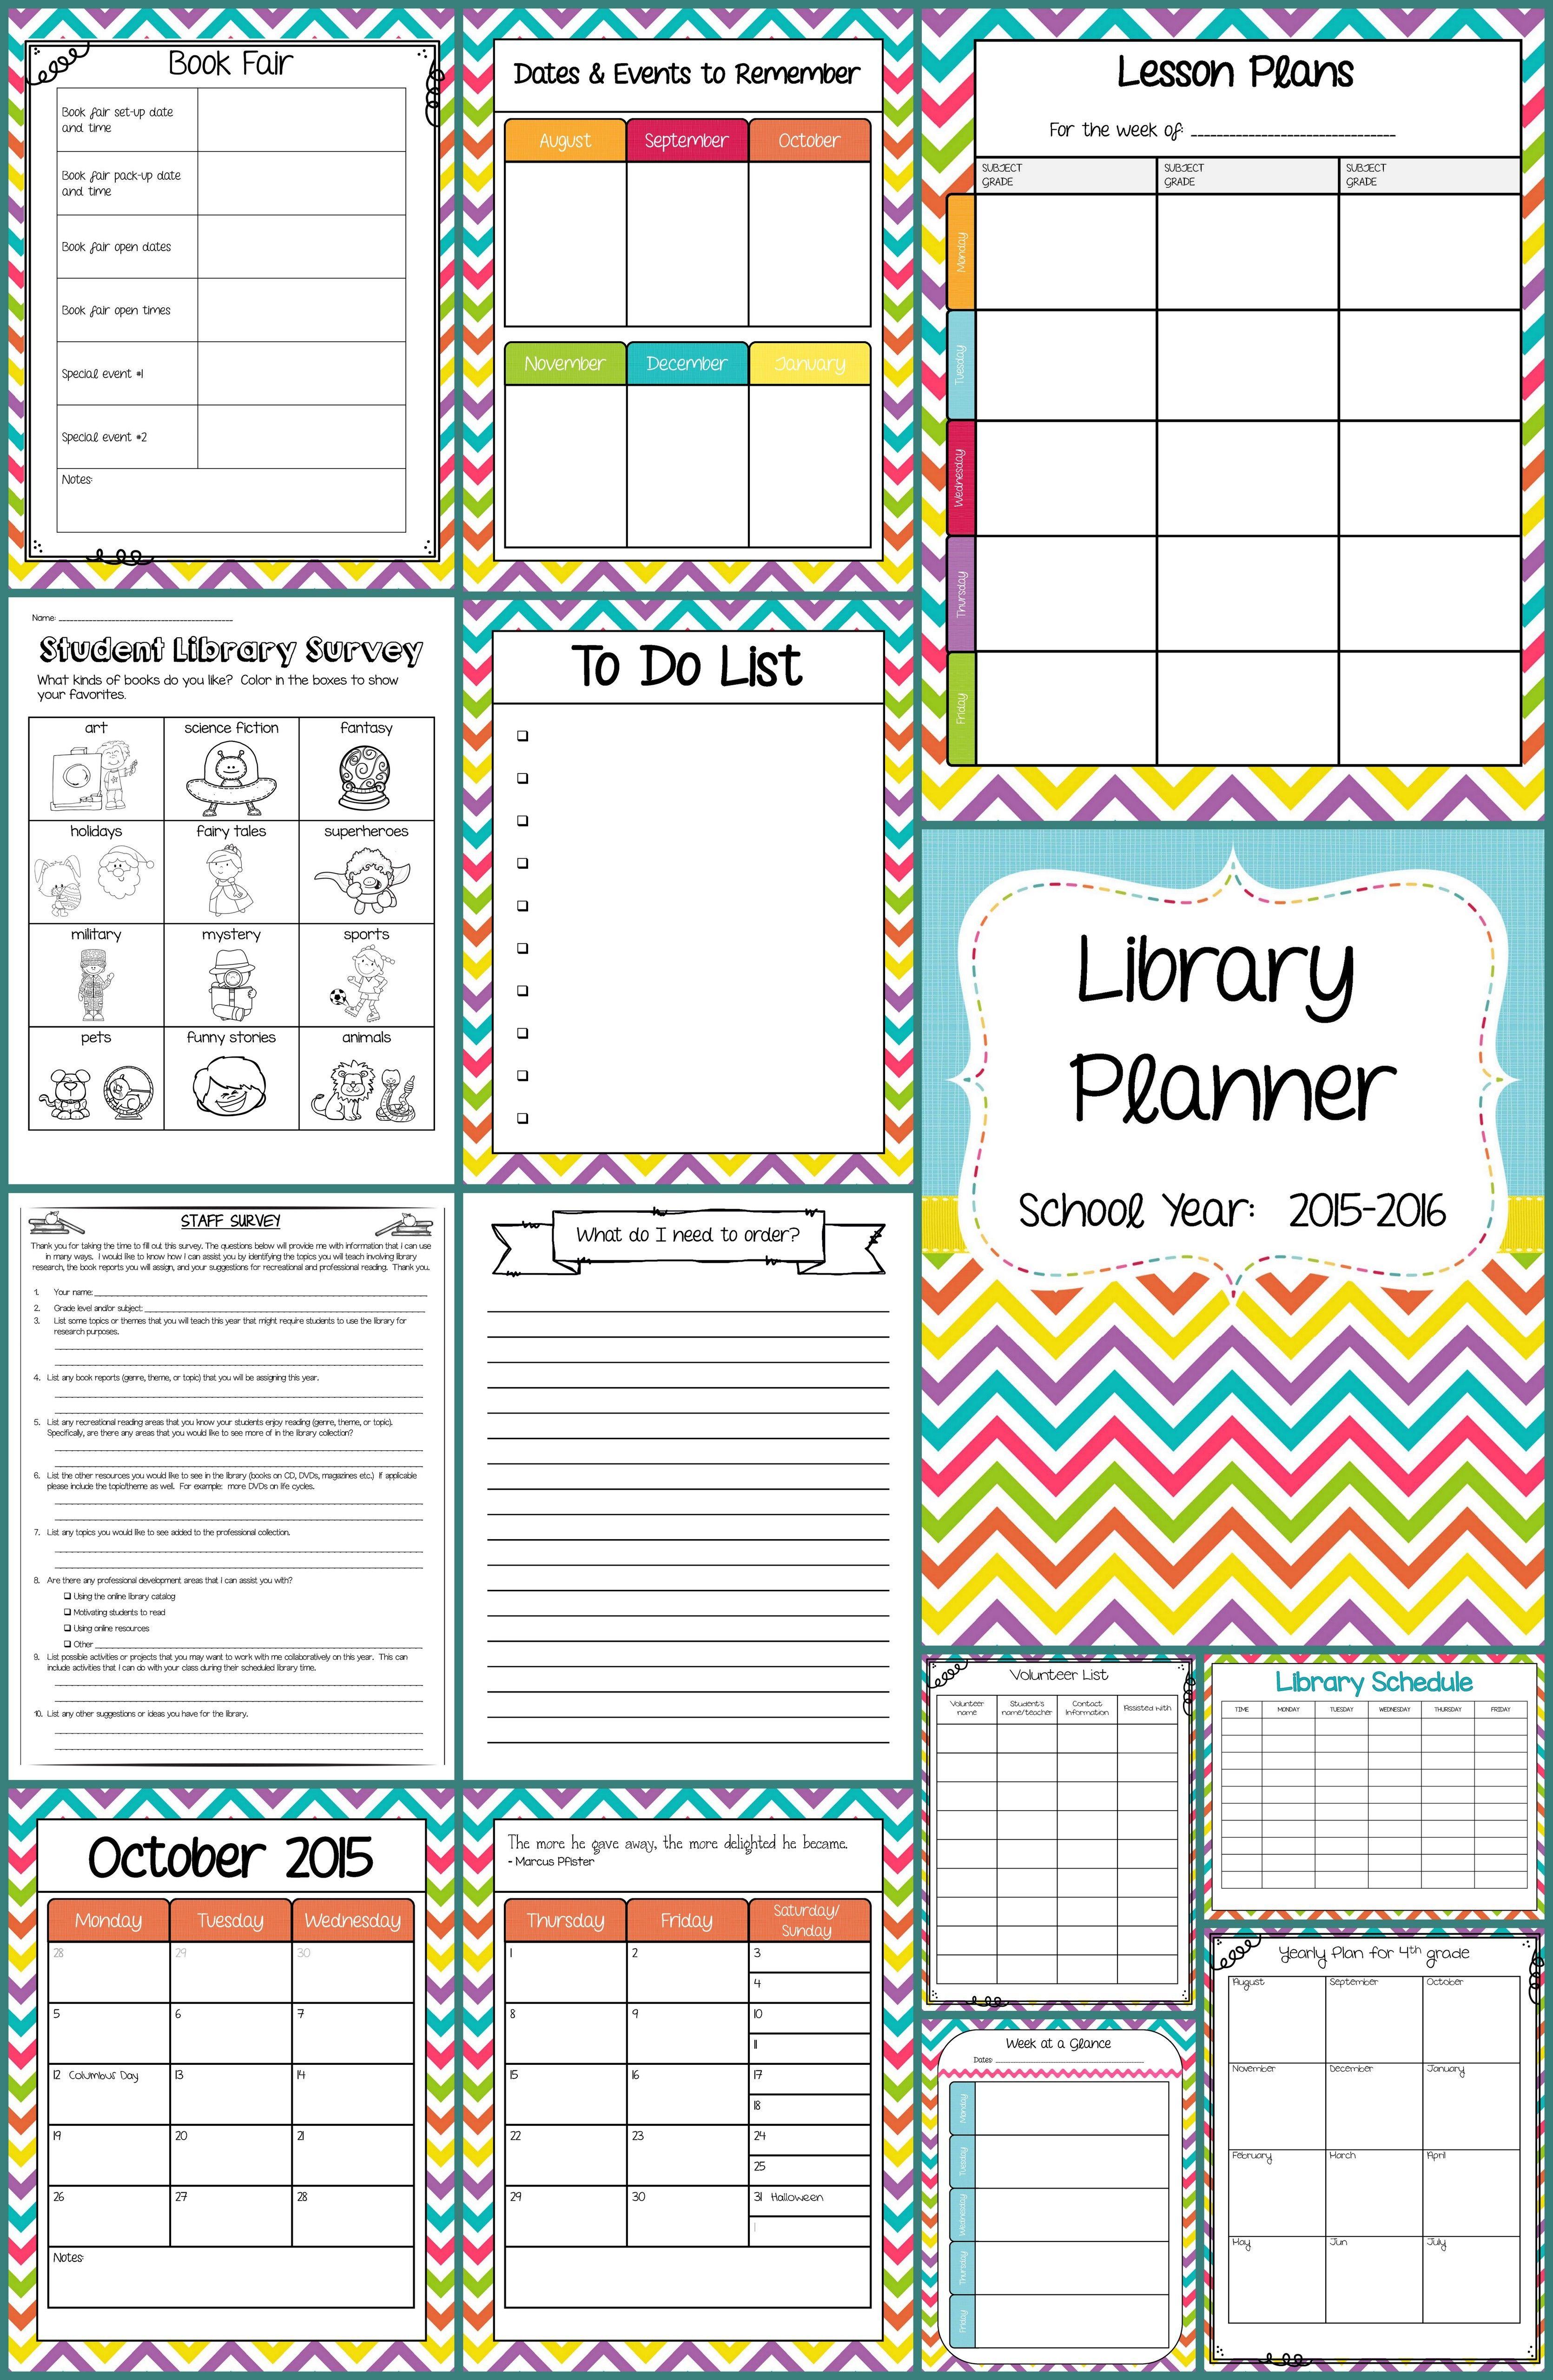 school library planner school librarian lesson plan. Black Bedroom Furniture Sets. Home Design Ideas